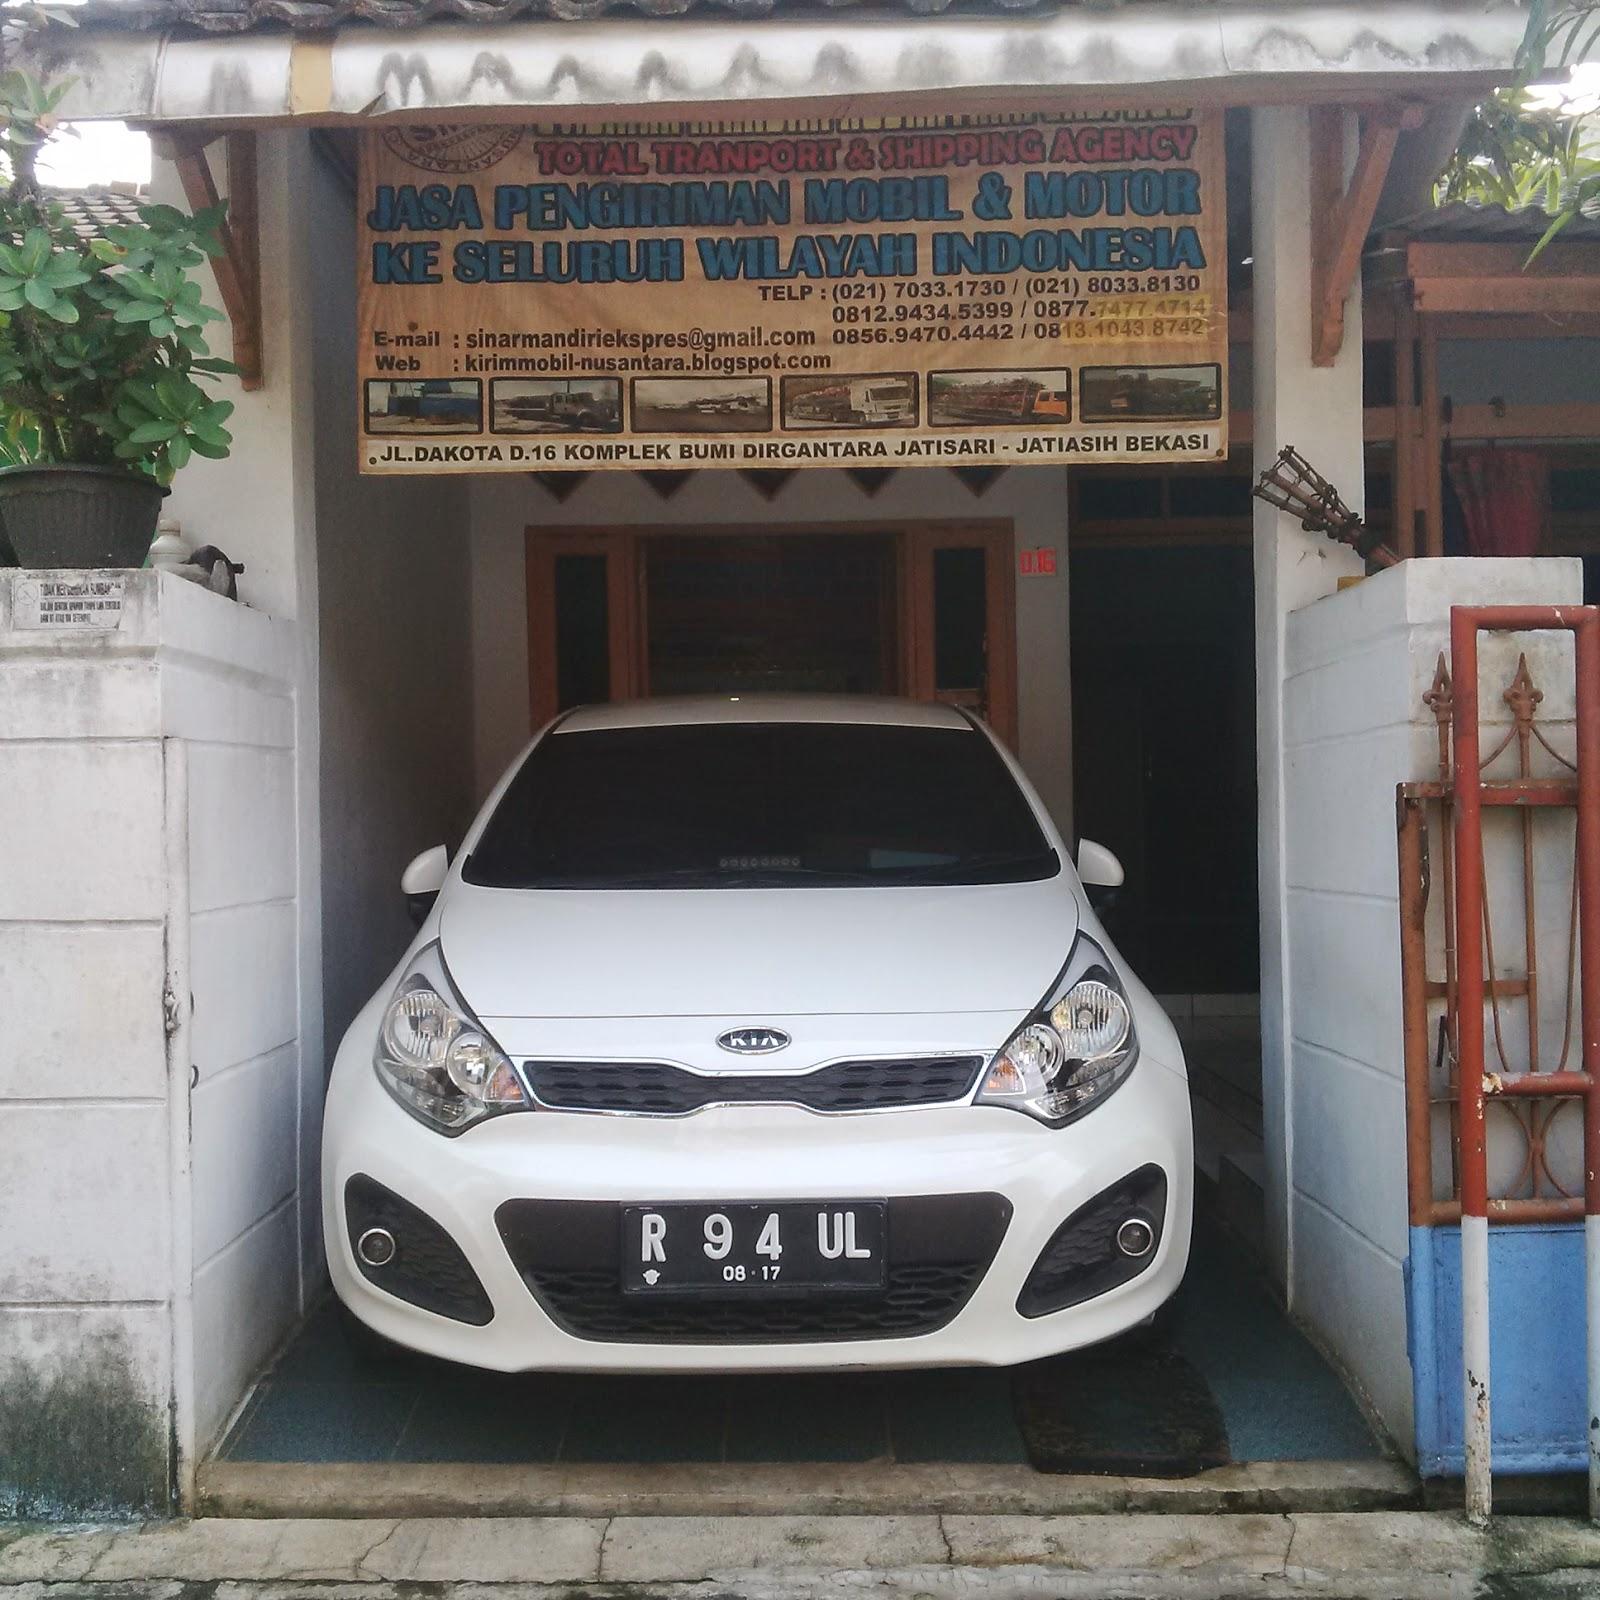 Pengiriman Kia Rio R 94 UL Jakarta ke Pontianak